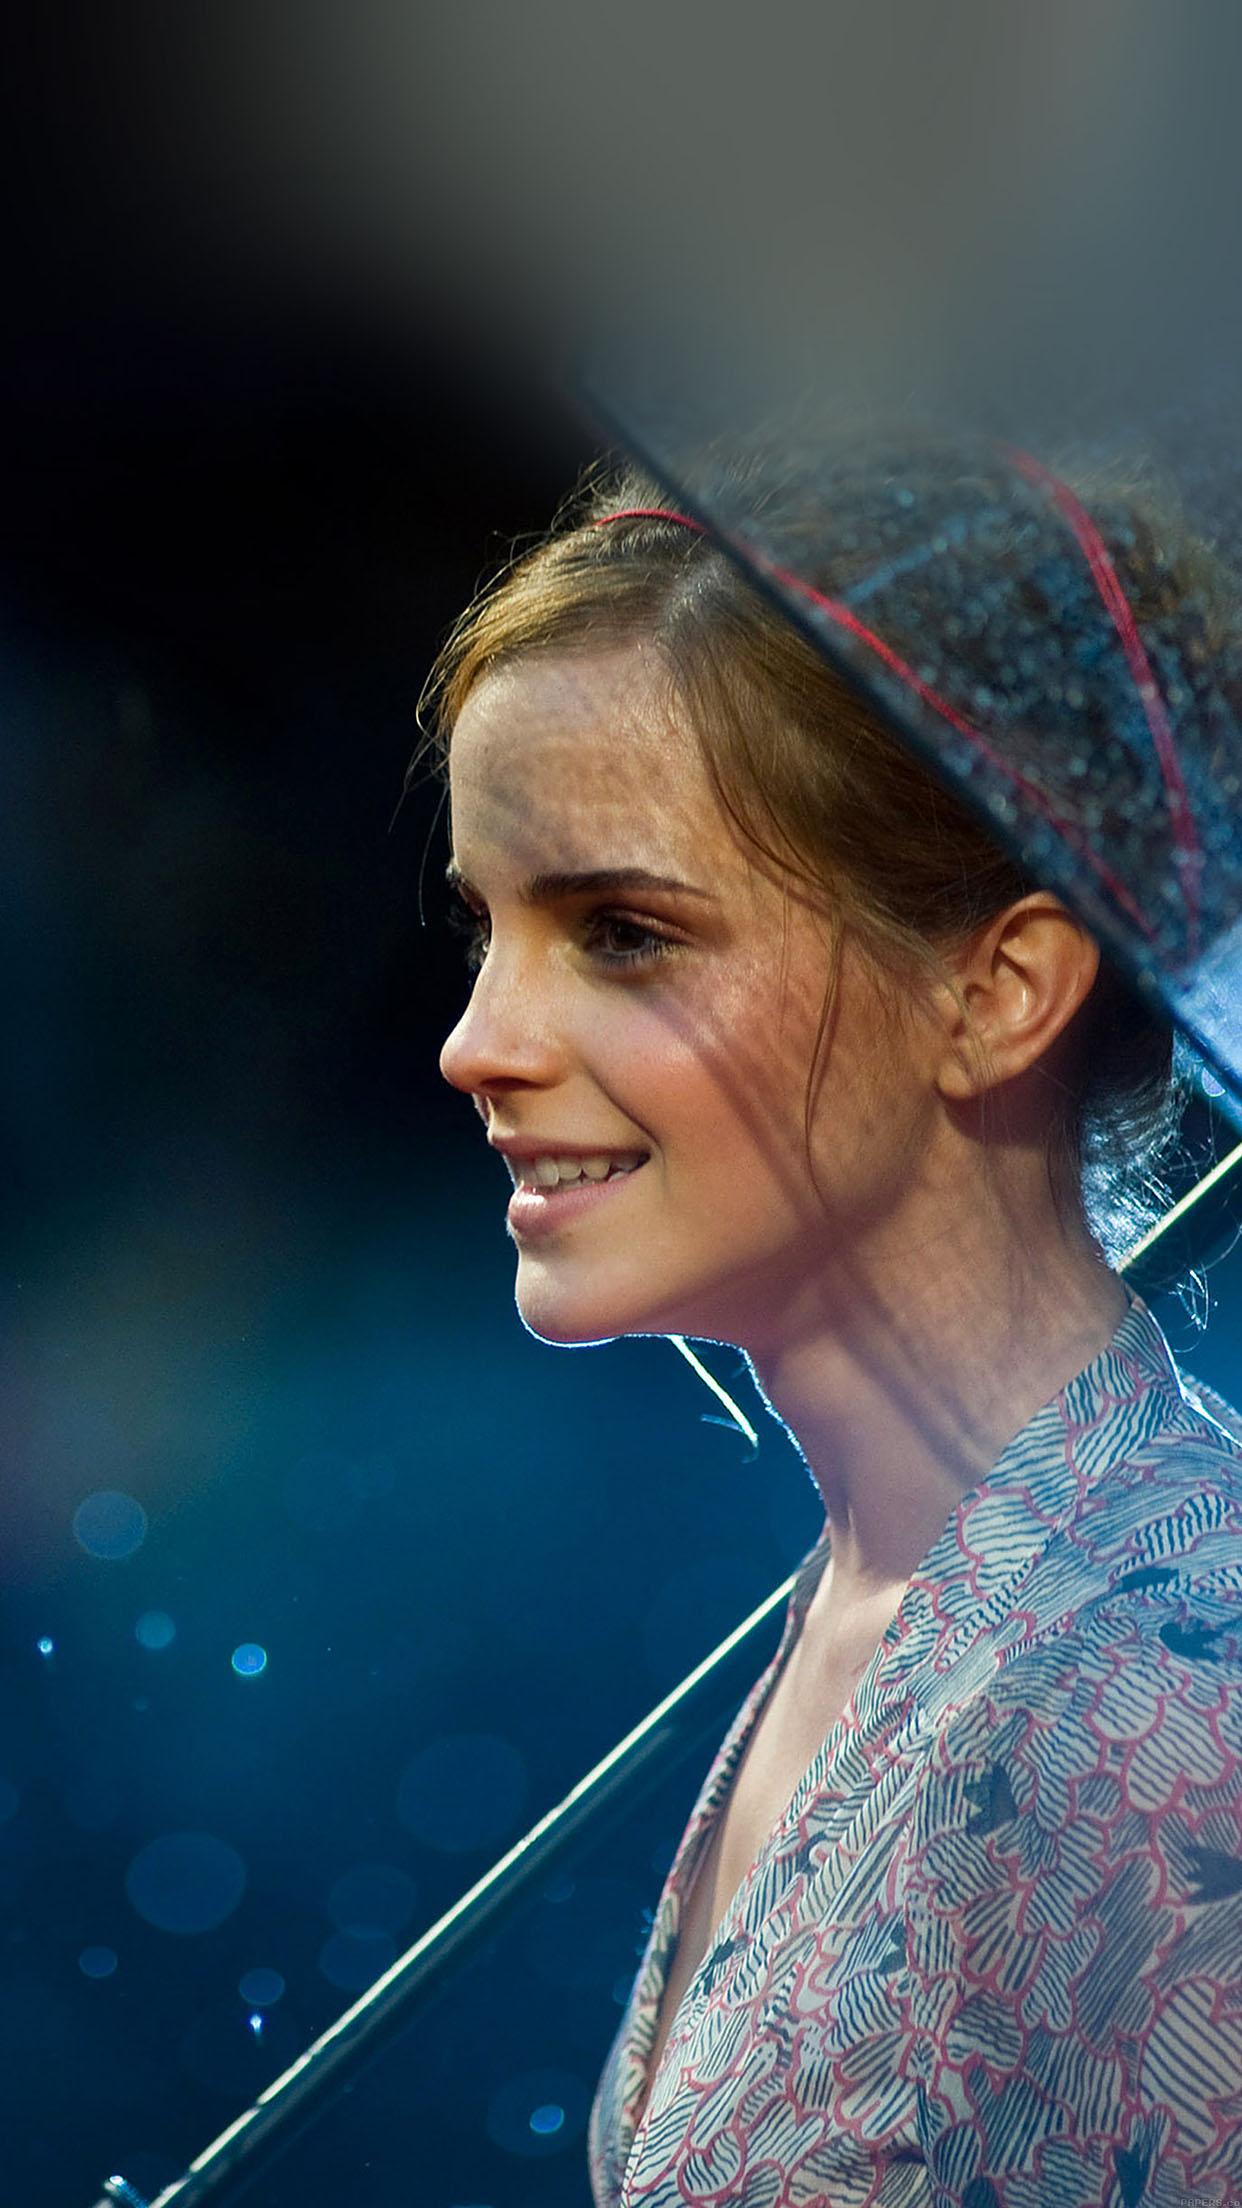 Wallpaper Emma Watson In Rain Girl Film Face Android ...